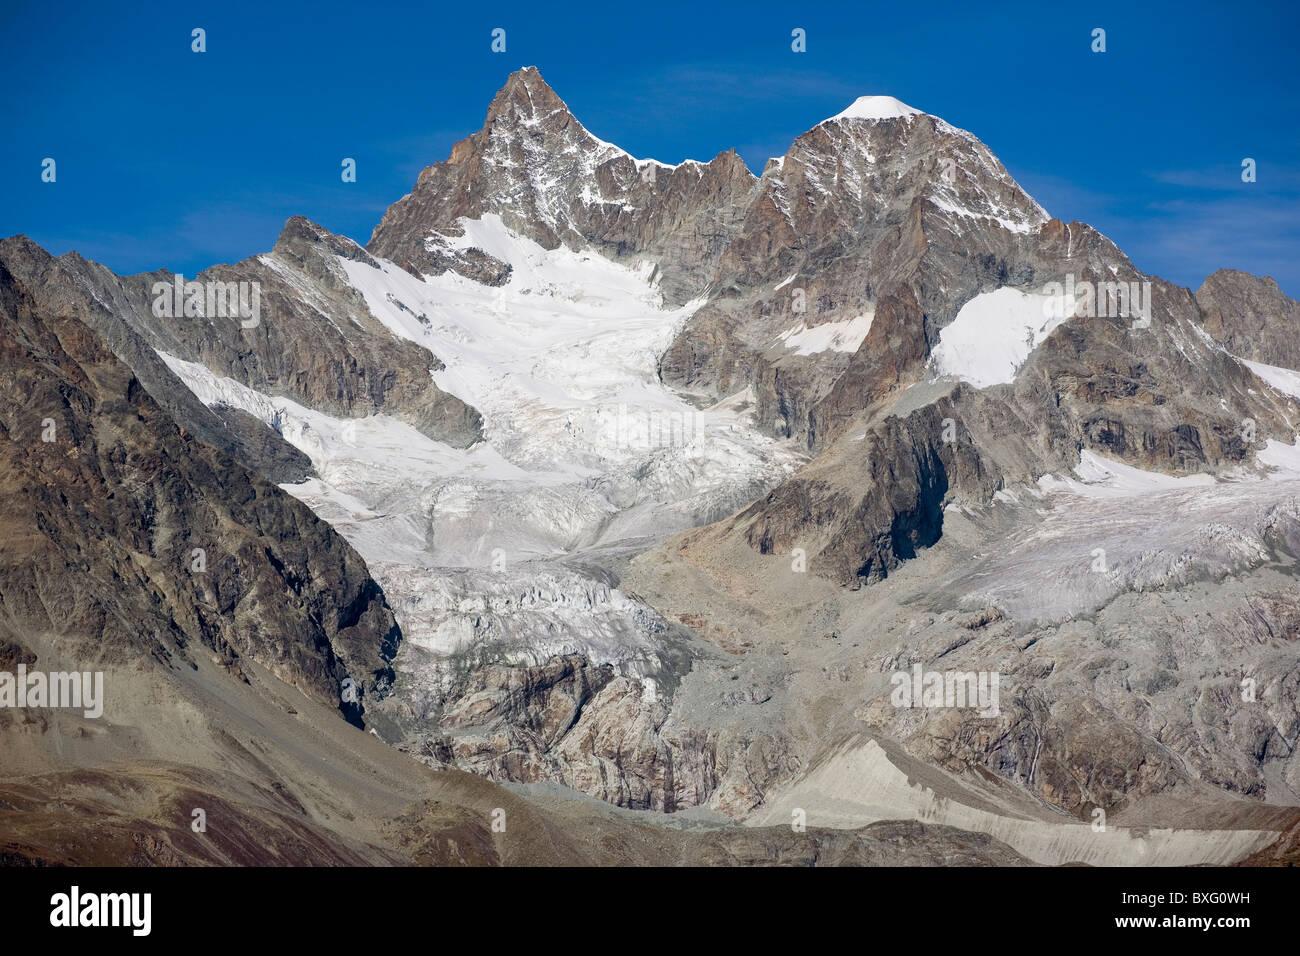 Ober Gabelhorn mountain, Switzerland Stock Photo